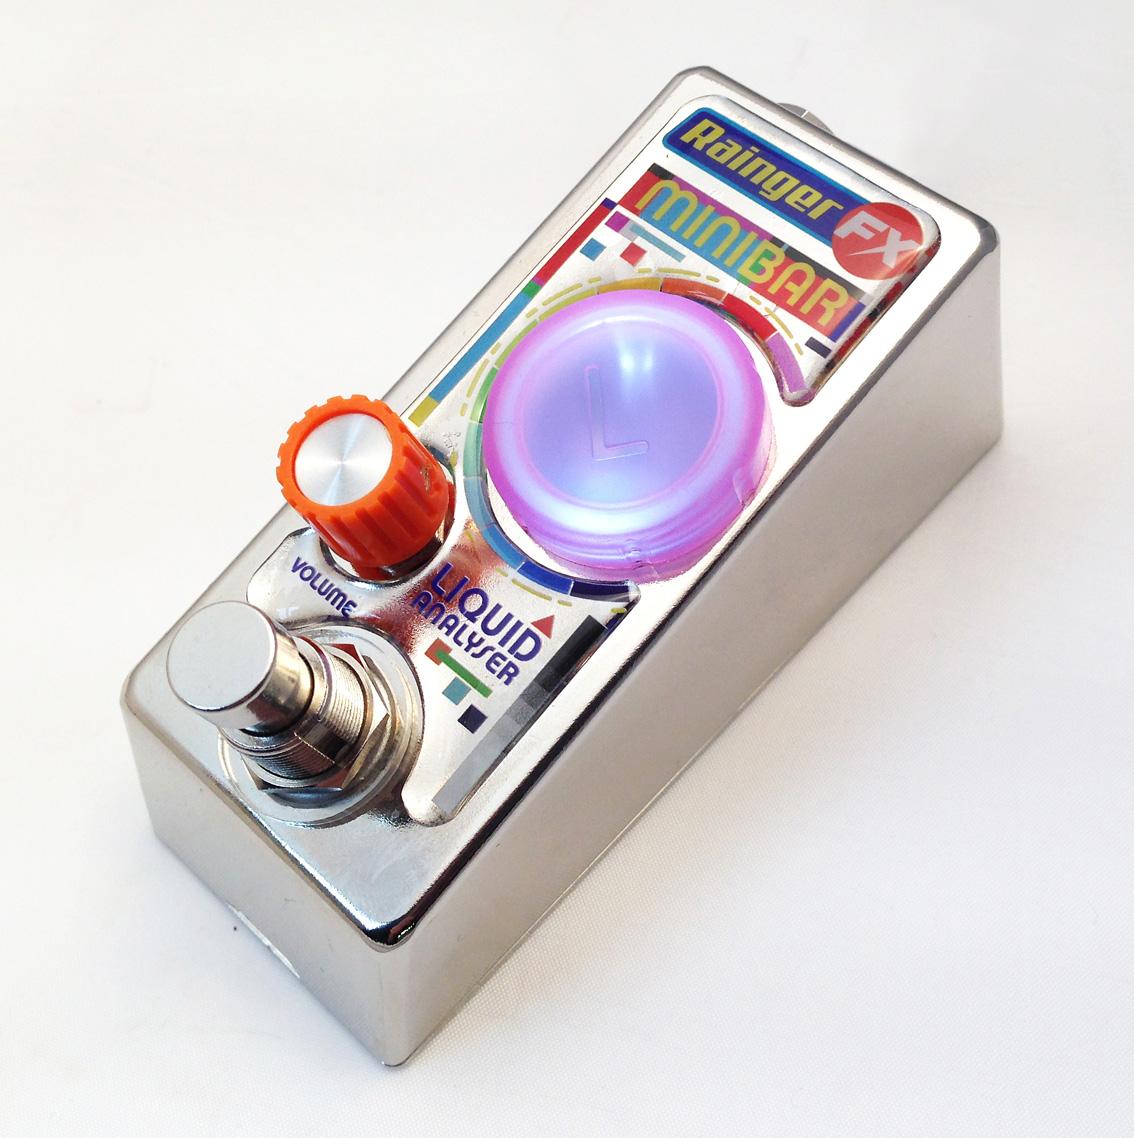 Minibar (Rainger FX)